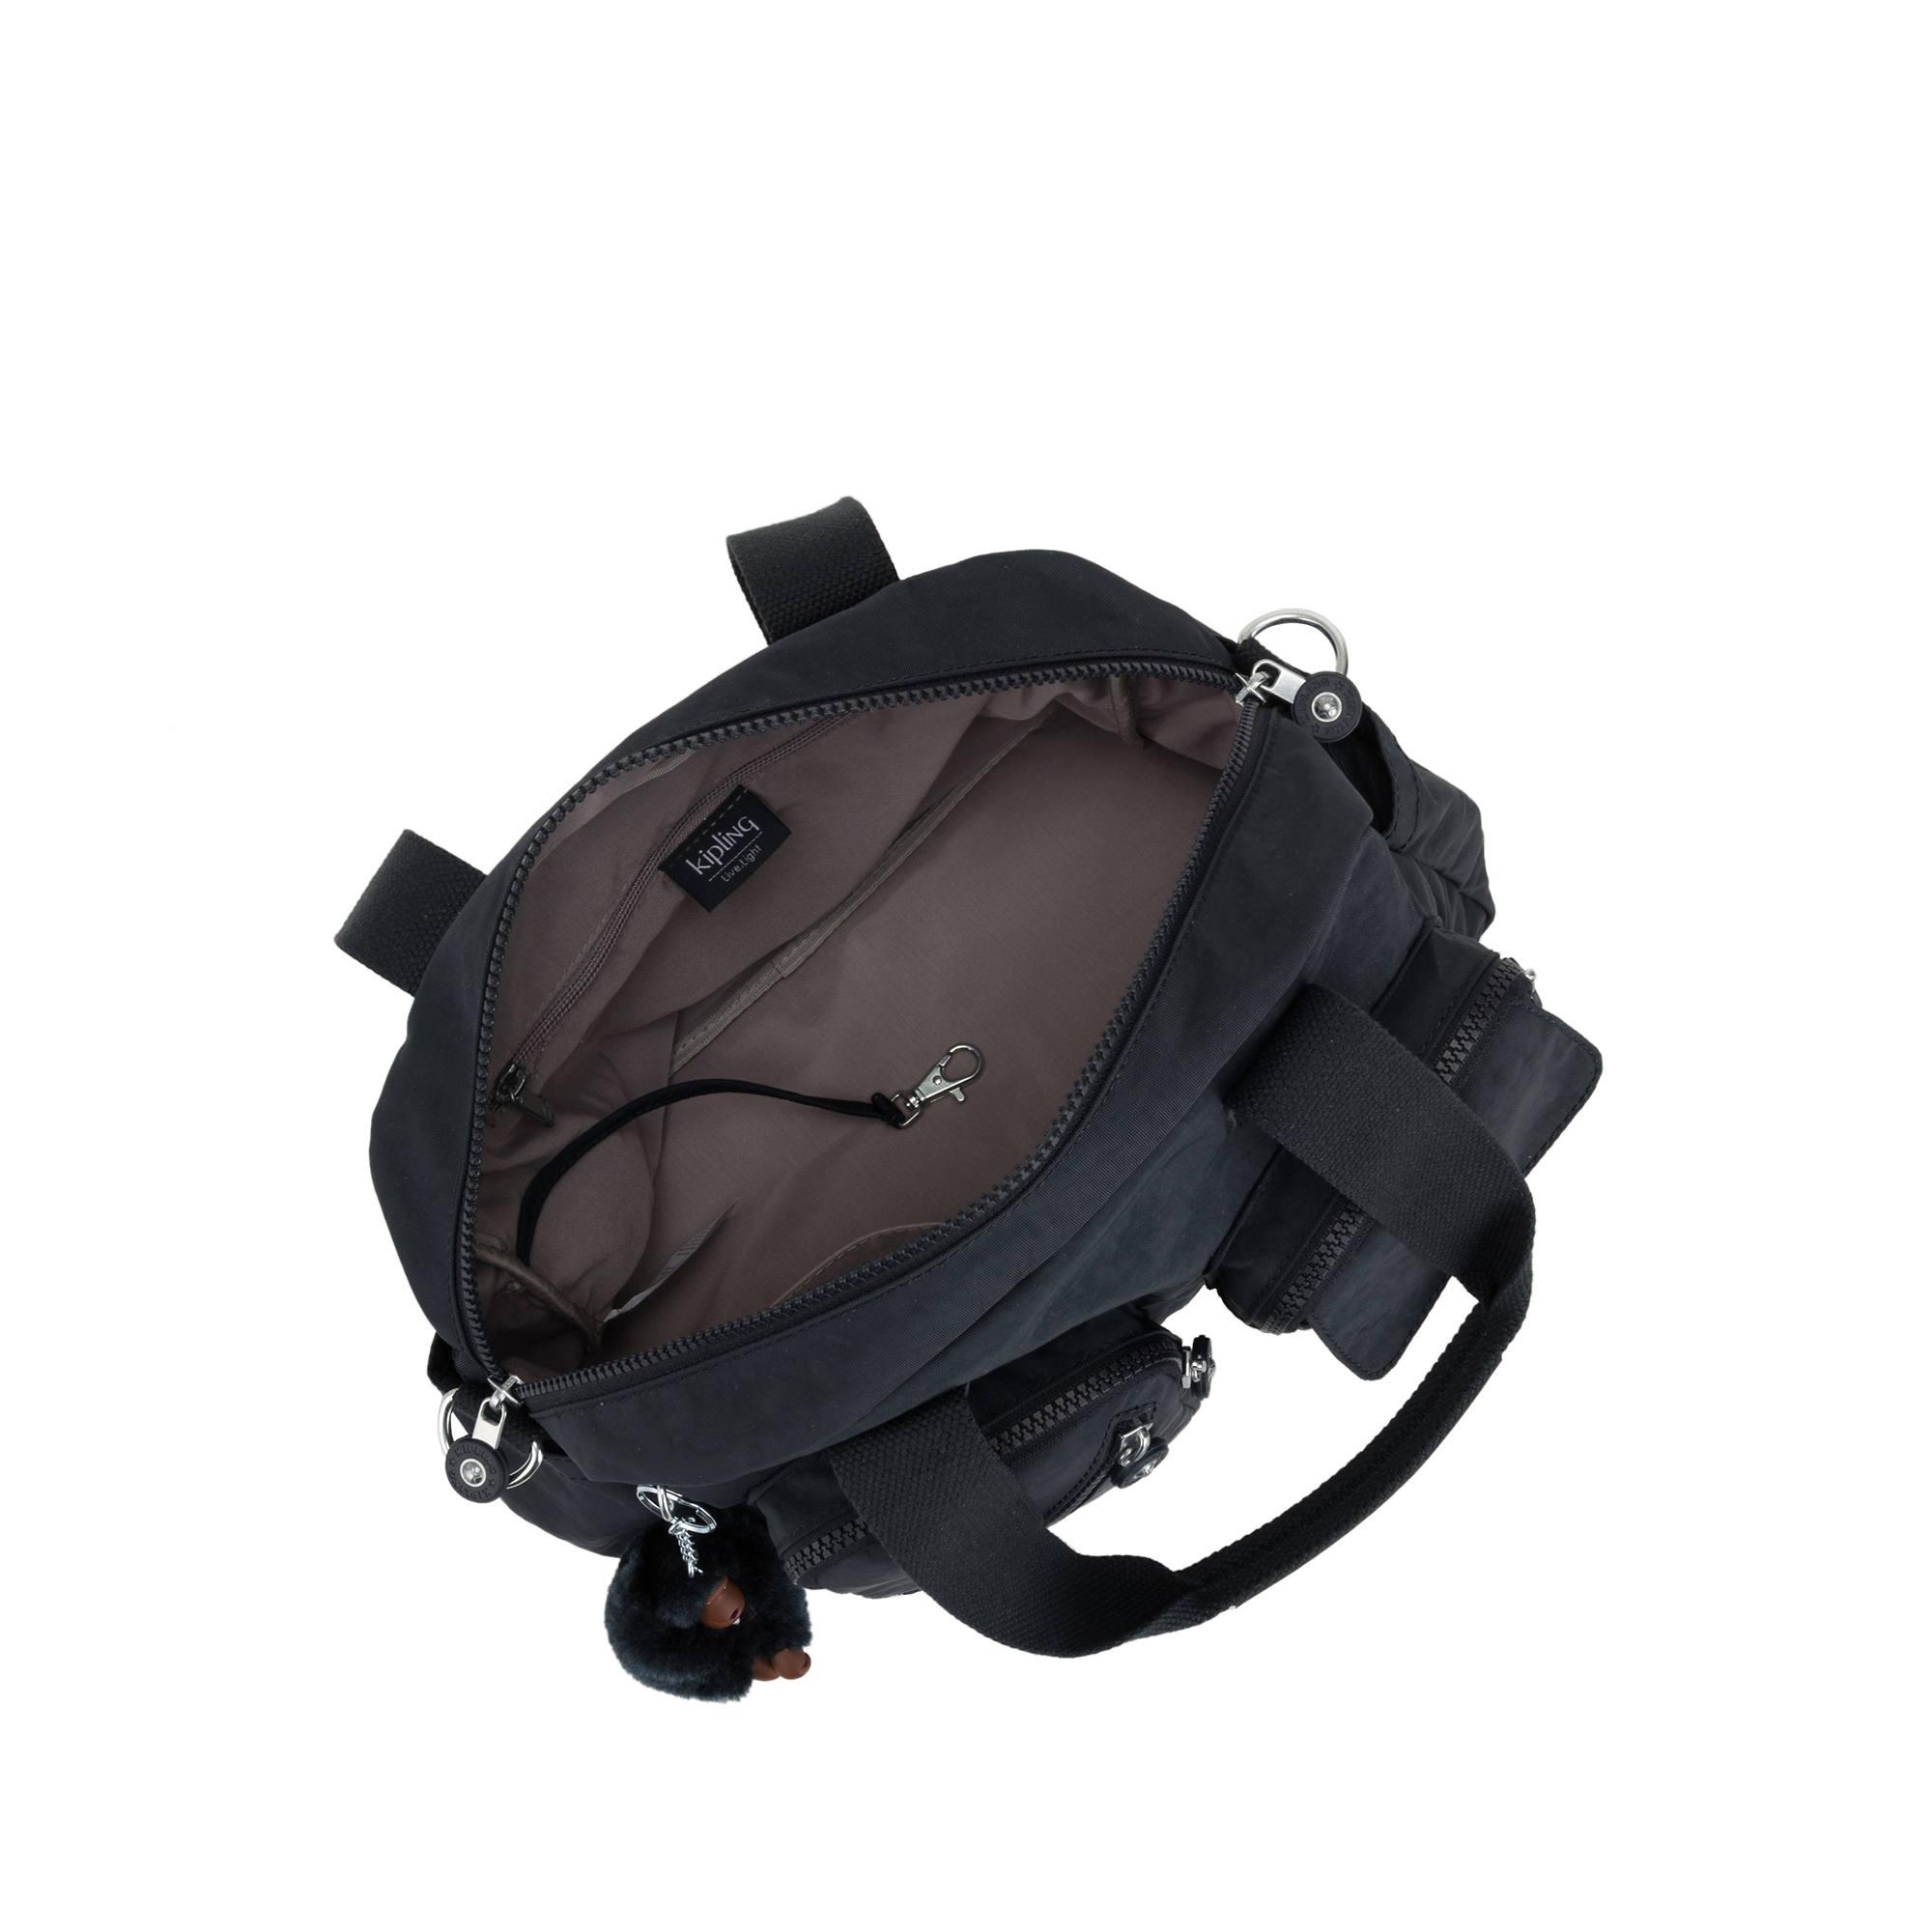 Kipling-Defea-Handbag miniatura 18